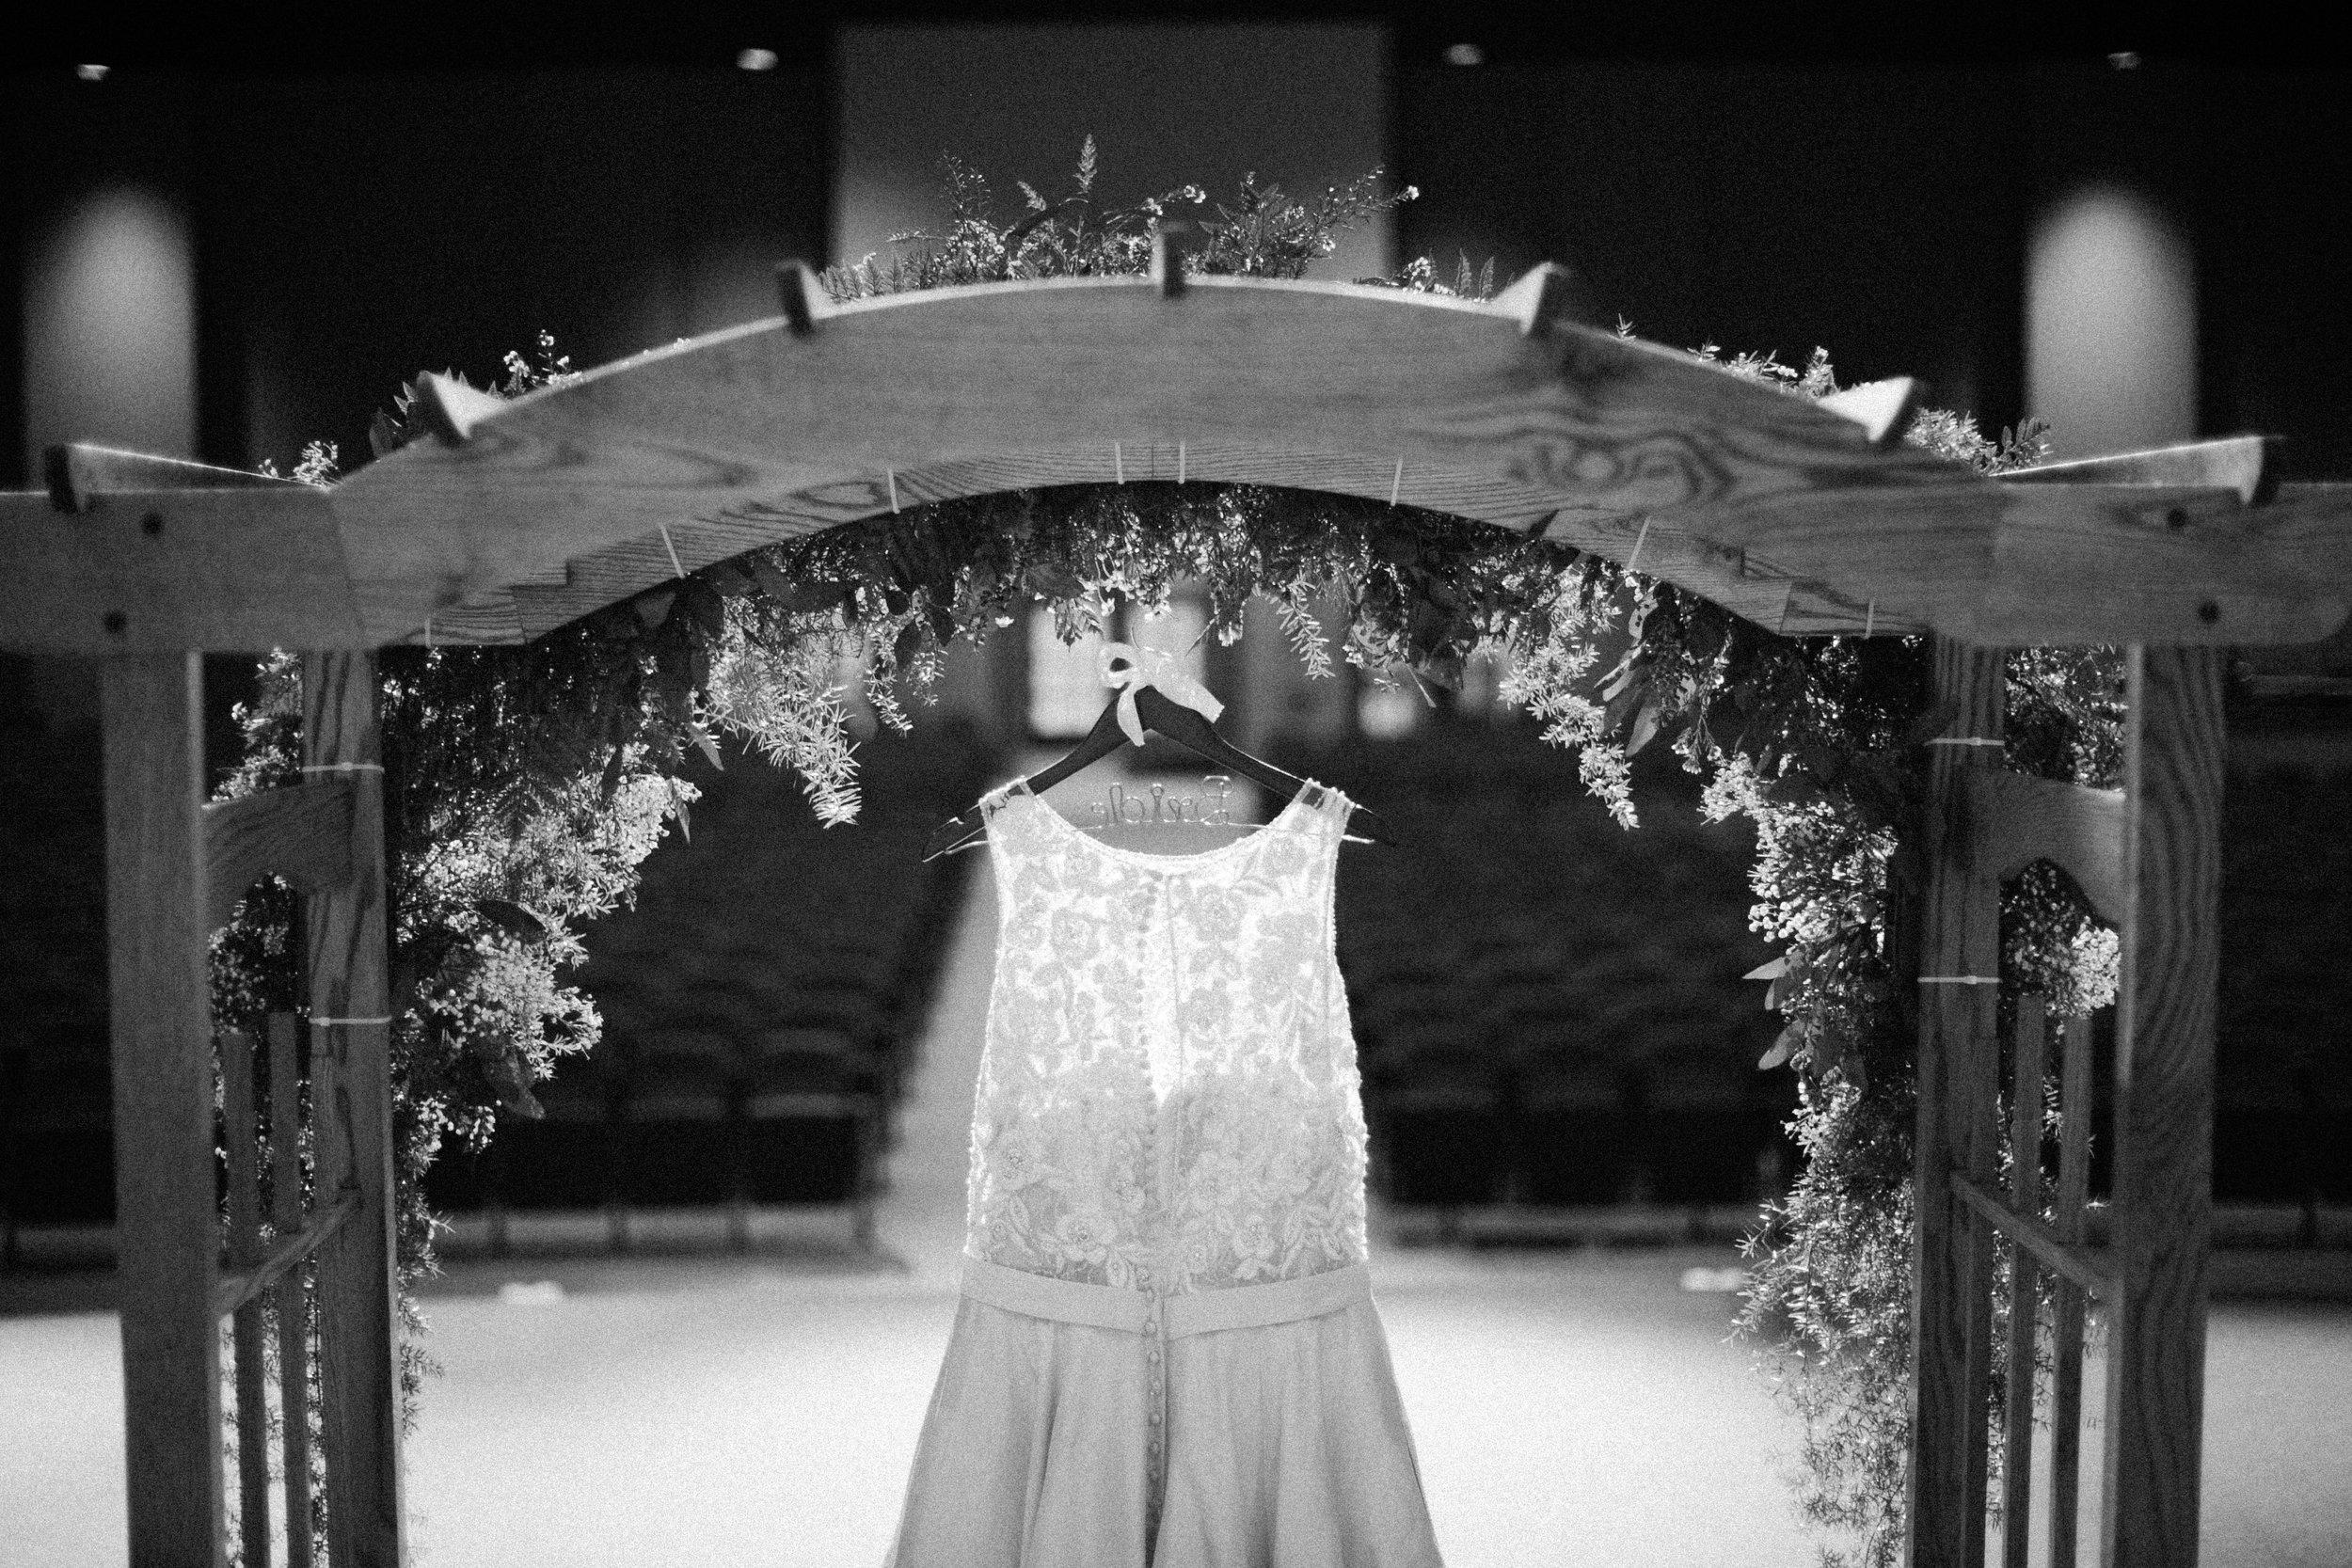 iowa-city-photographers-proposal-engagement-wedding-13.jpg